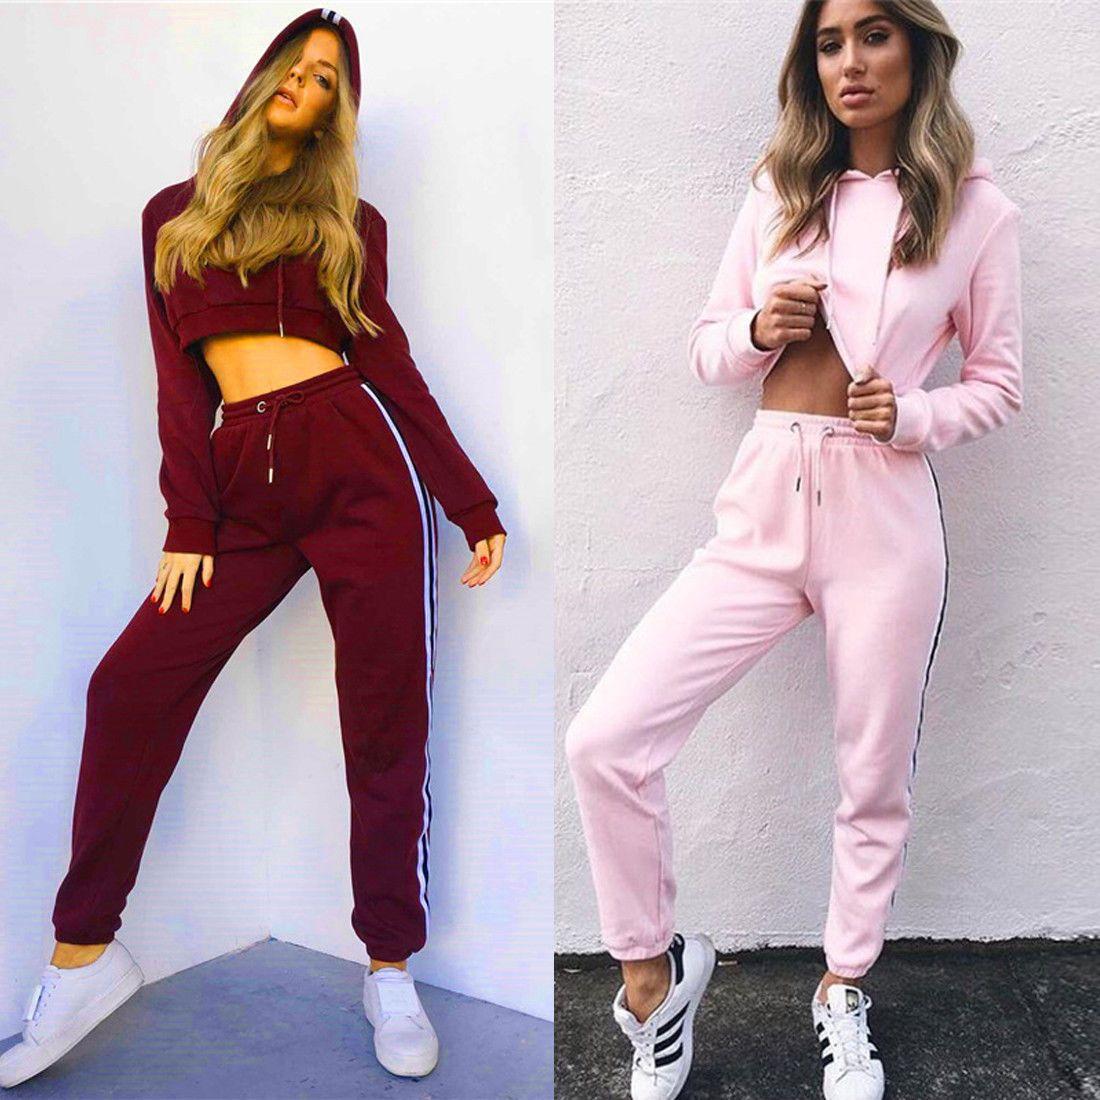 c12a96fa4 2Pcs Women Casual Sweatshirt Long Sleeve Hoodie Crop Top Track Pants Sports  Suit